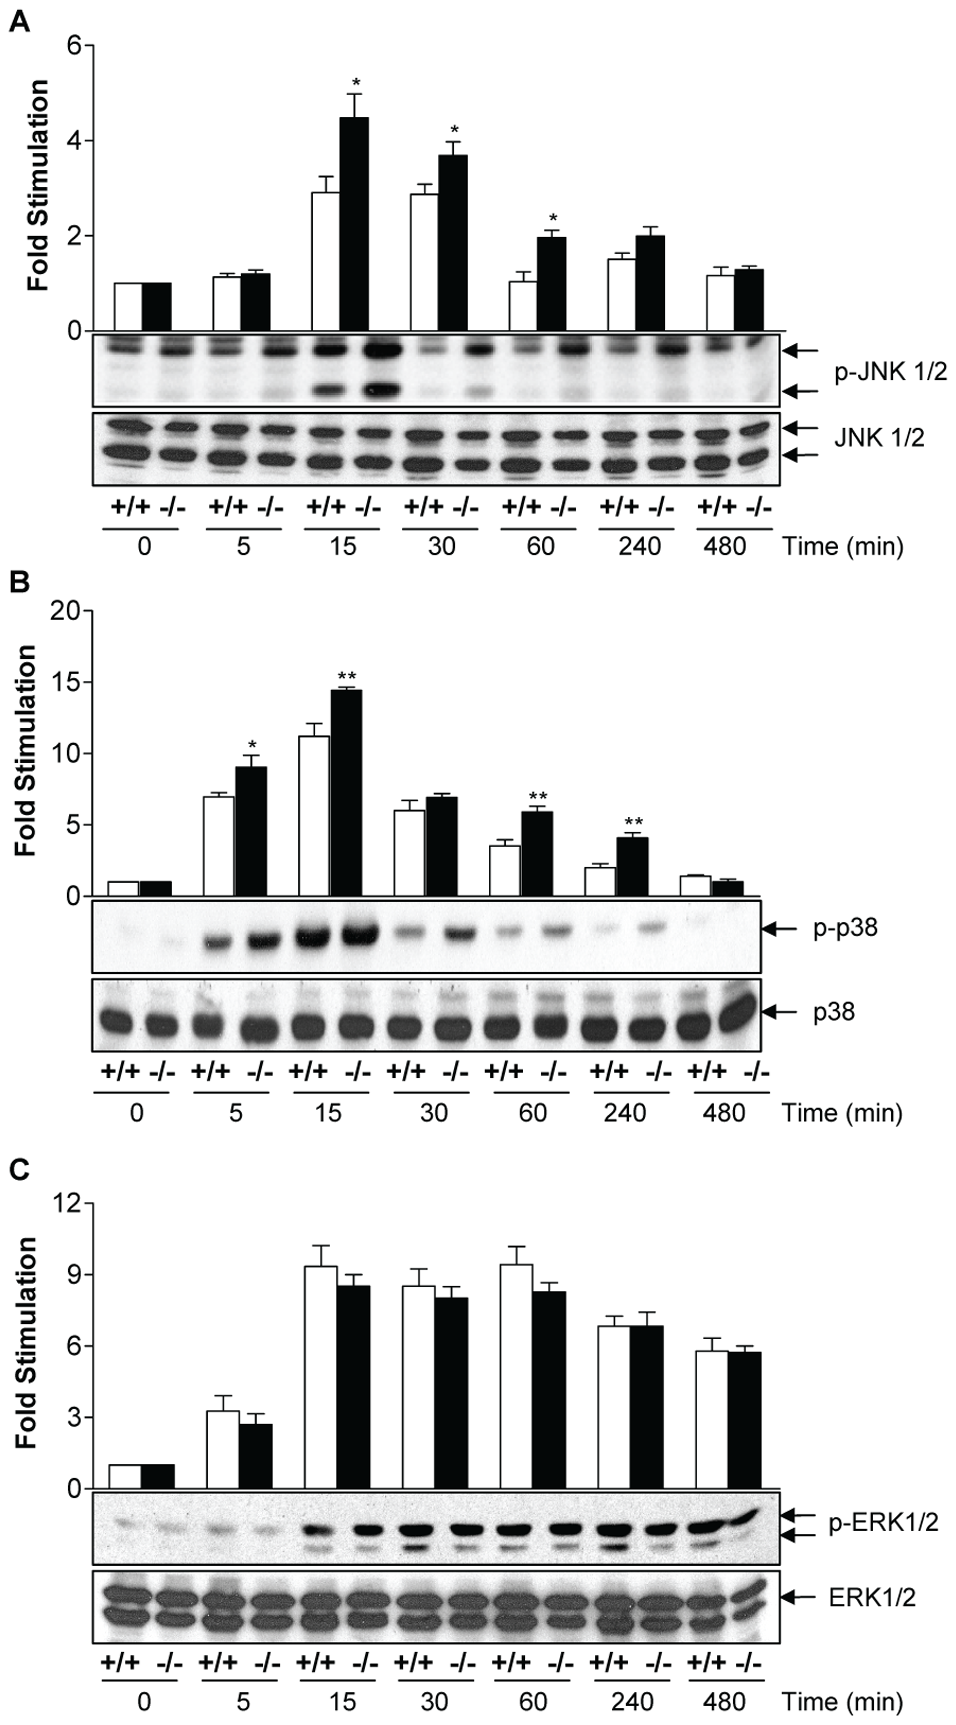 MKP-2 deletion enhances LPS -stimulated MAP kinase phosphorylation in macrophages.